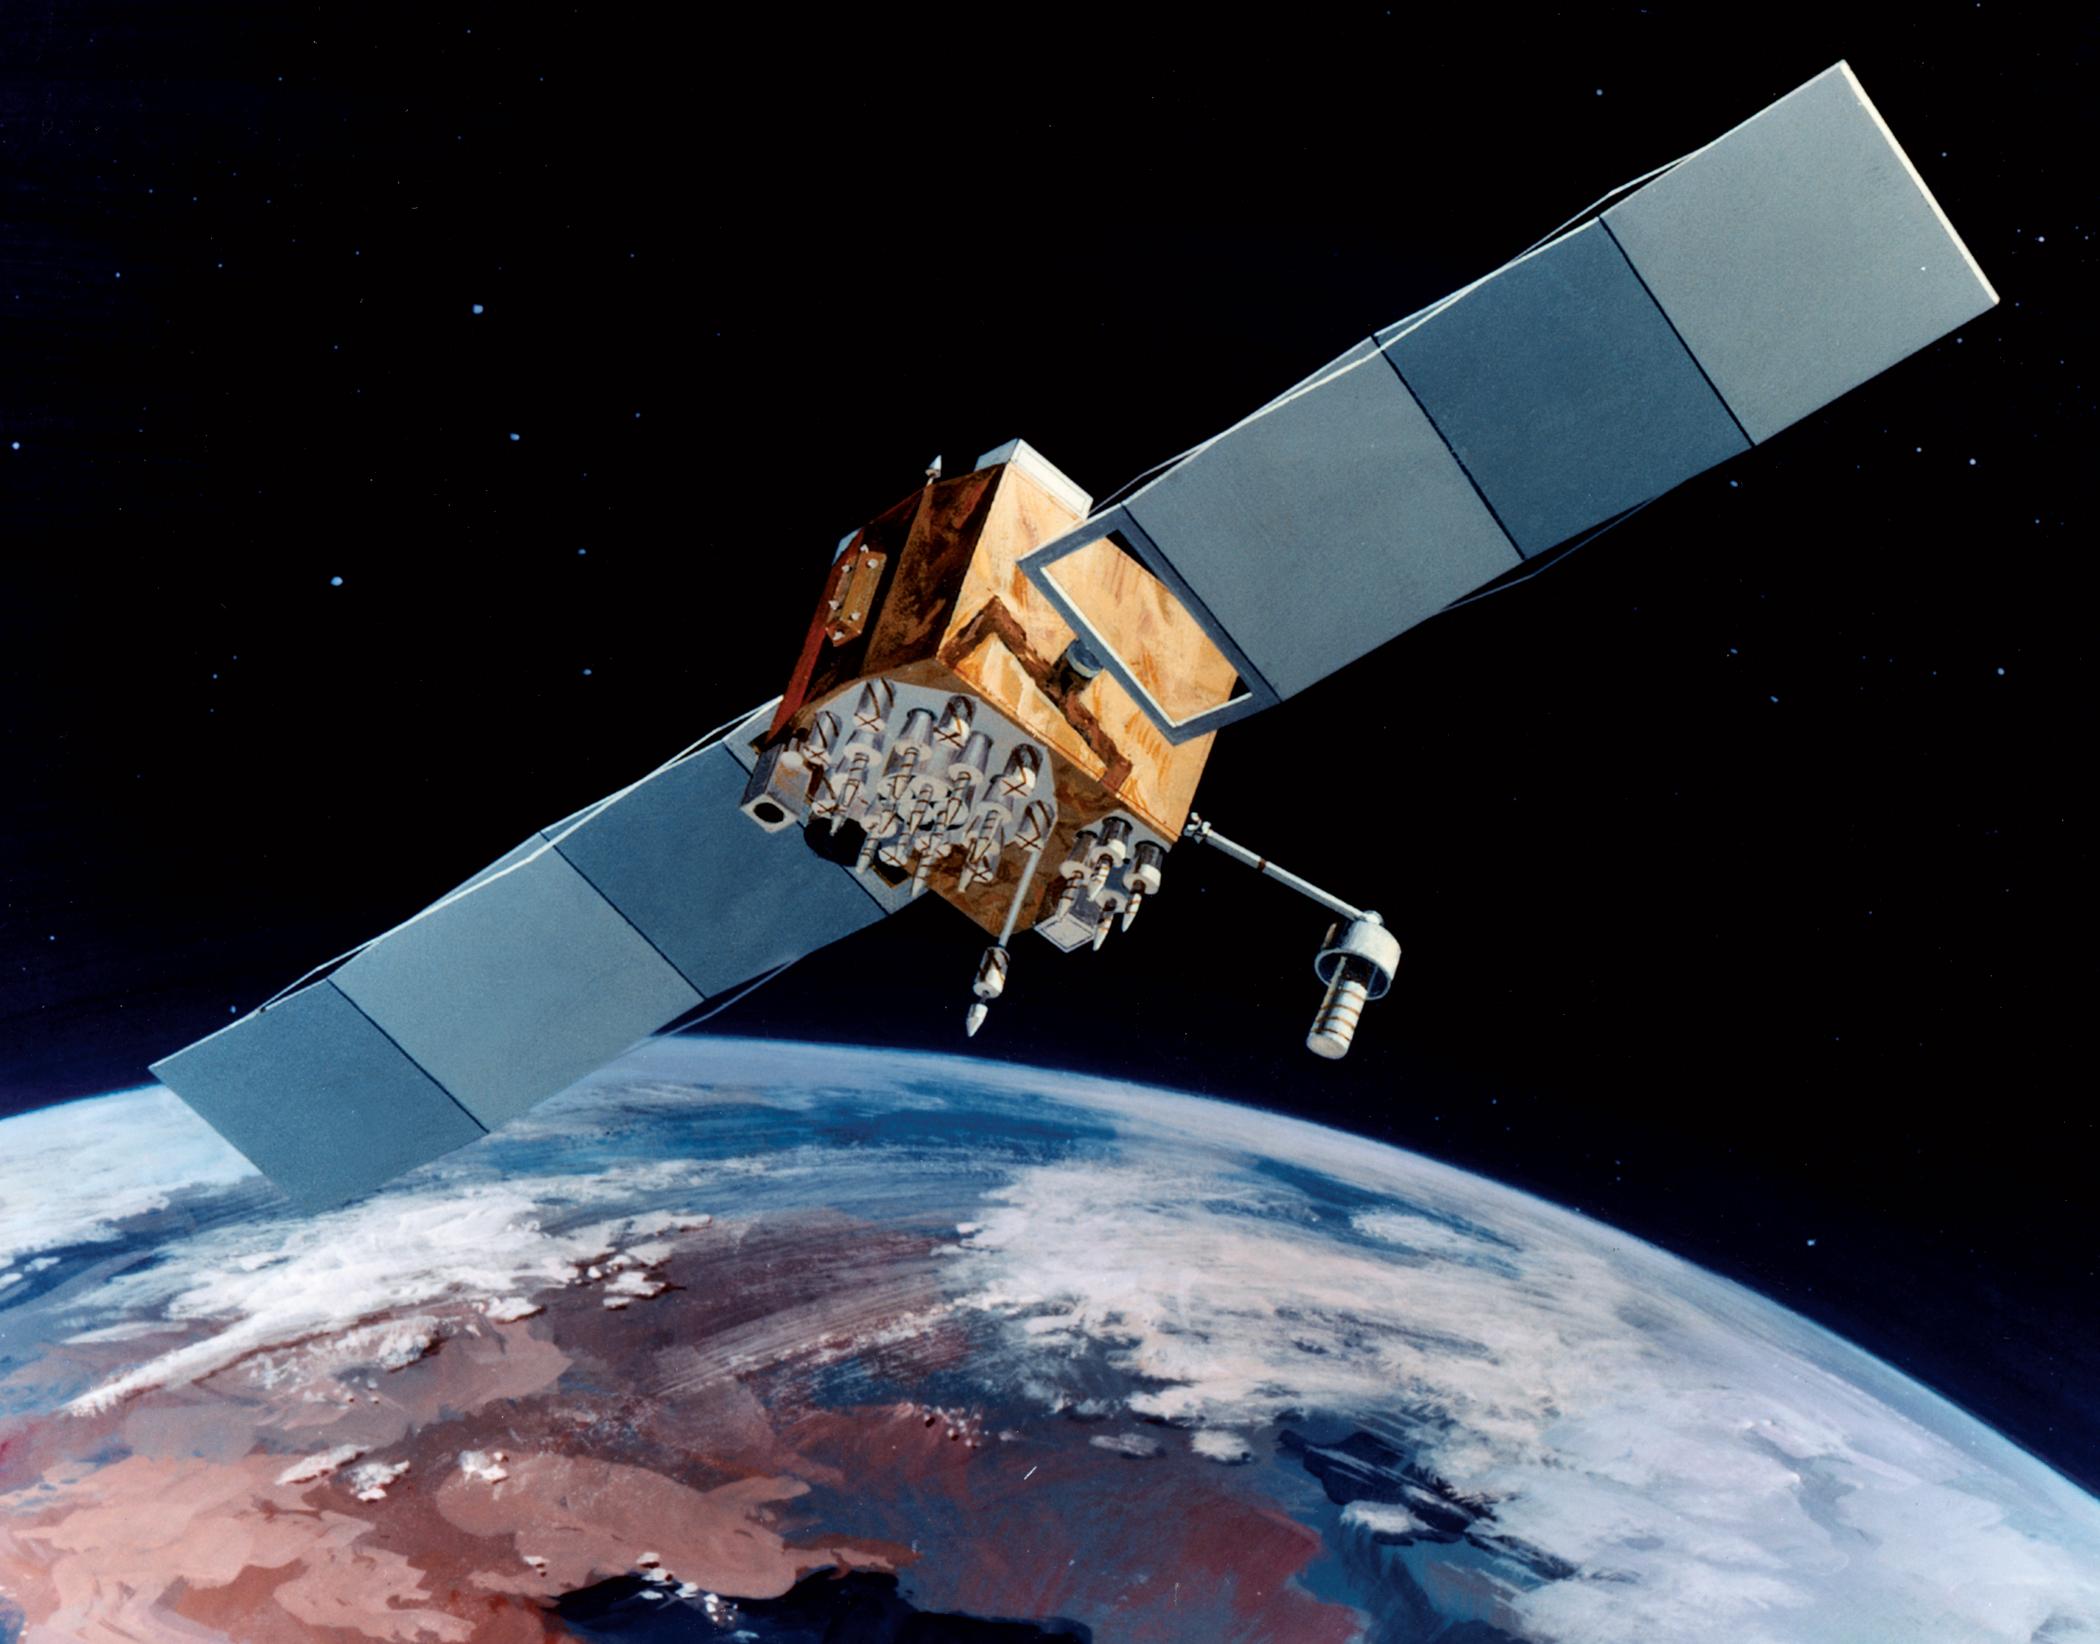 Navstar-2F satellite of the Global Positioning System (GPS). Image credit: USAF.